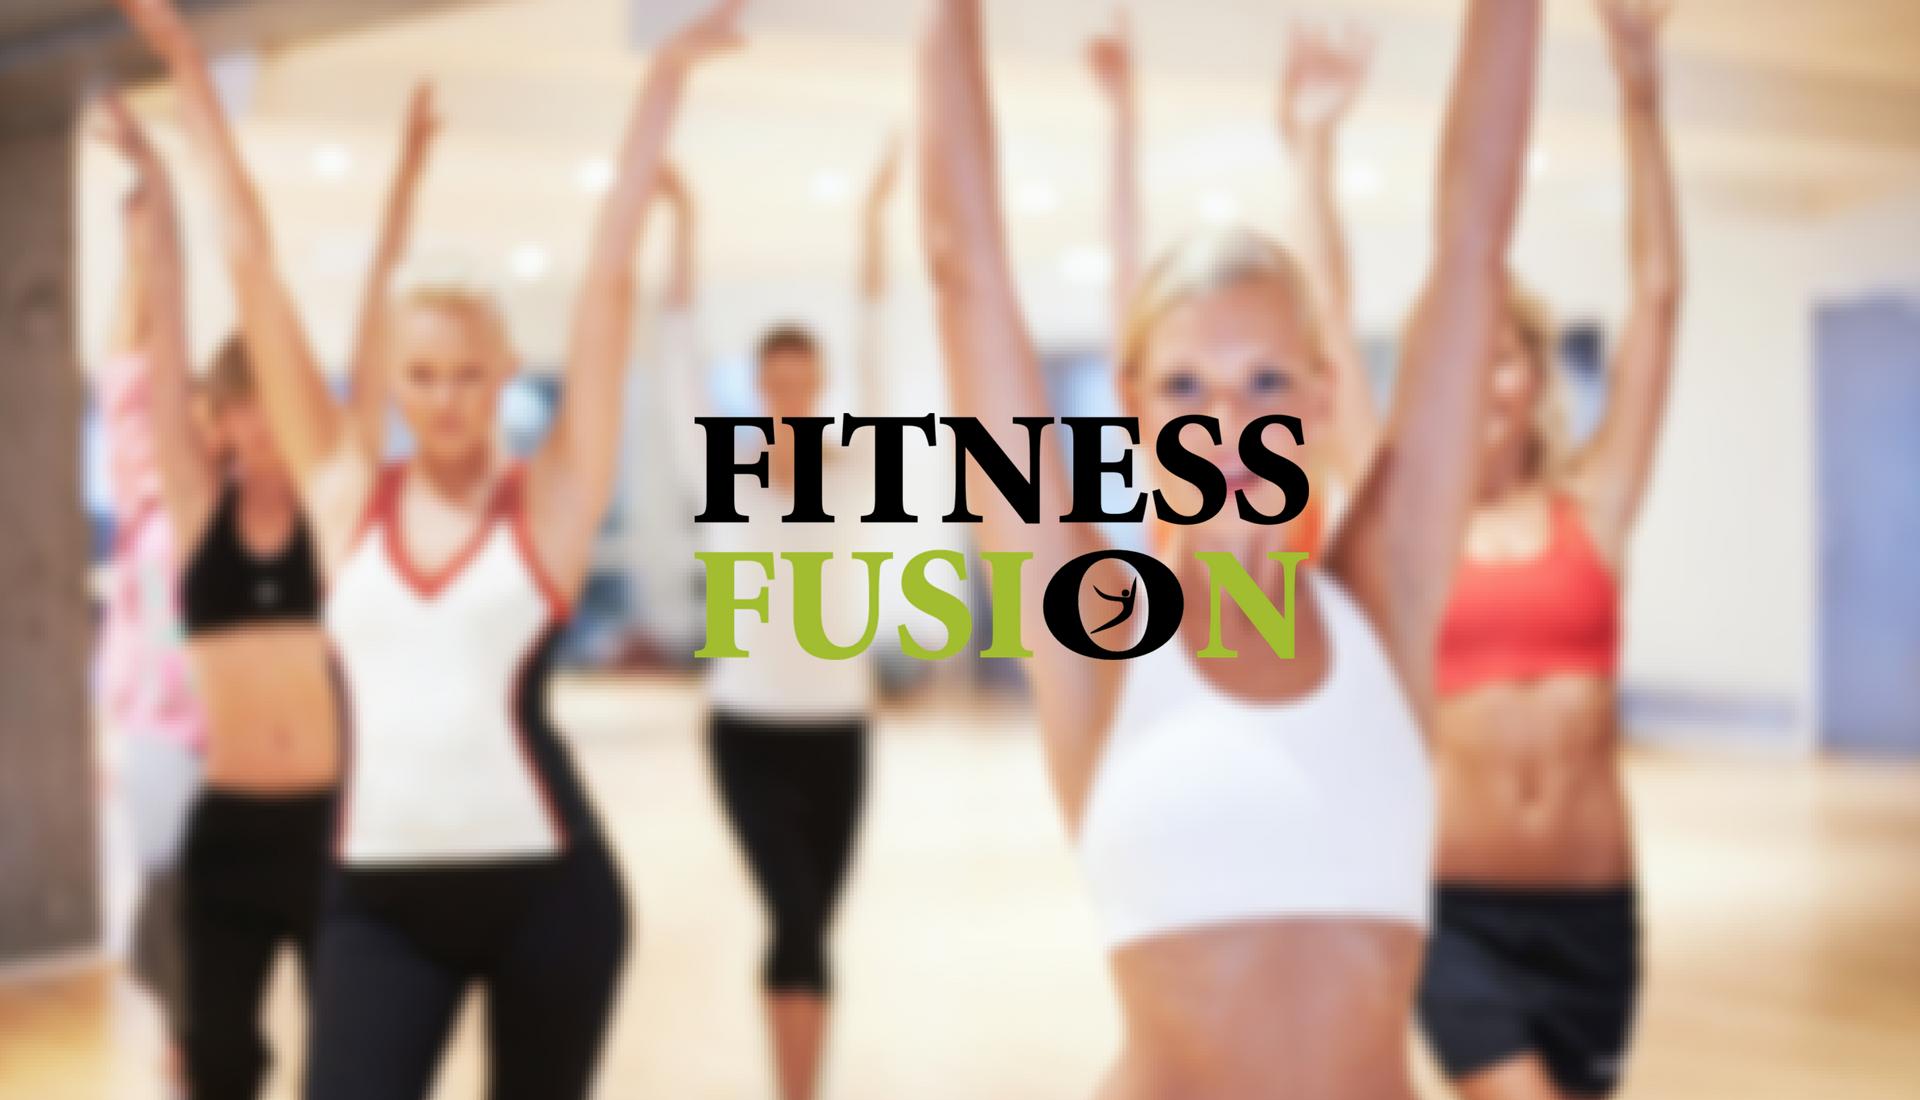 Fitnessfusion3